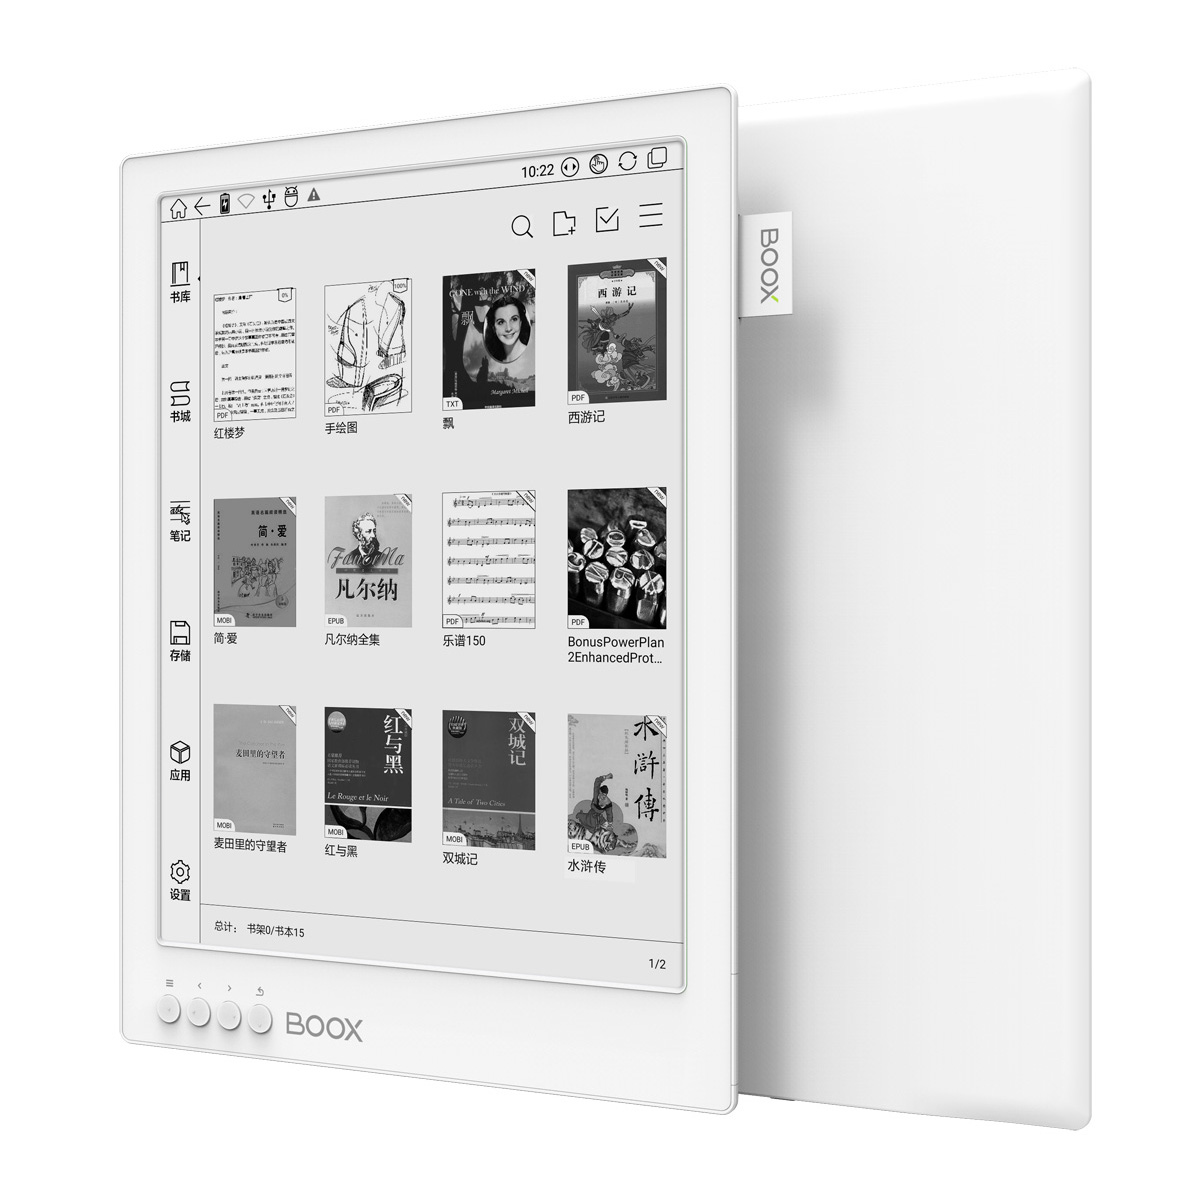 ONYX BOOX MAX 2 PRO eReader :: ONYX BOOX electronic books